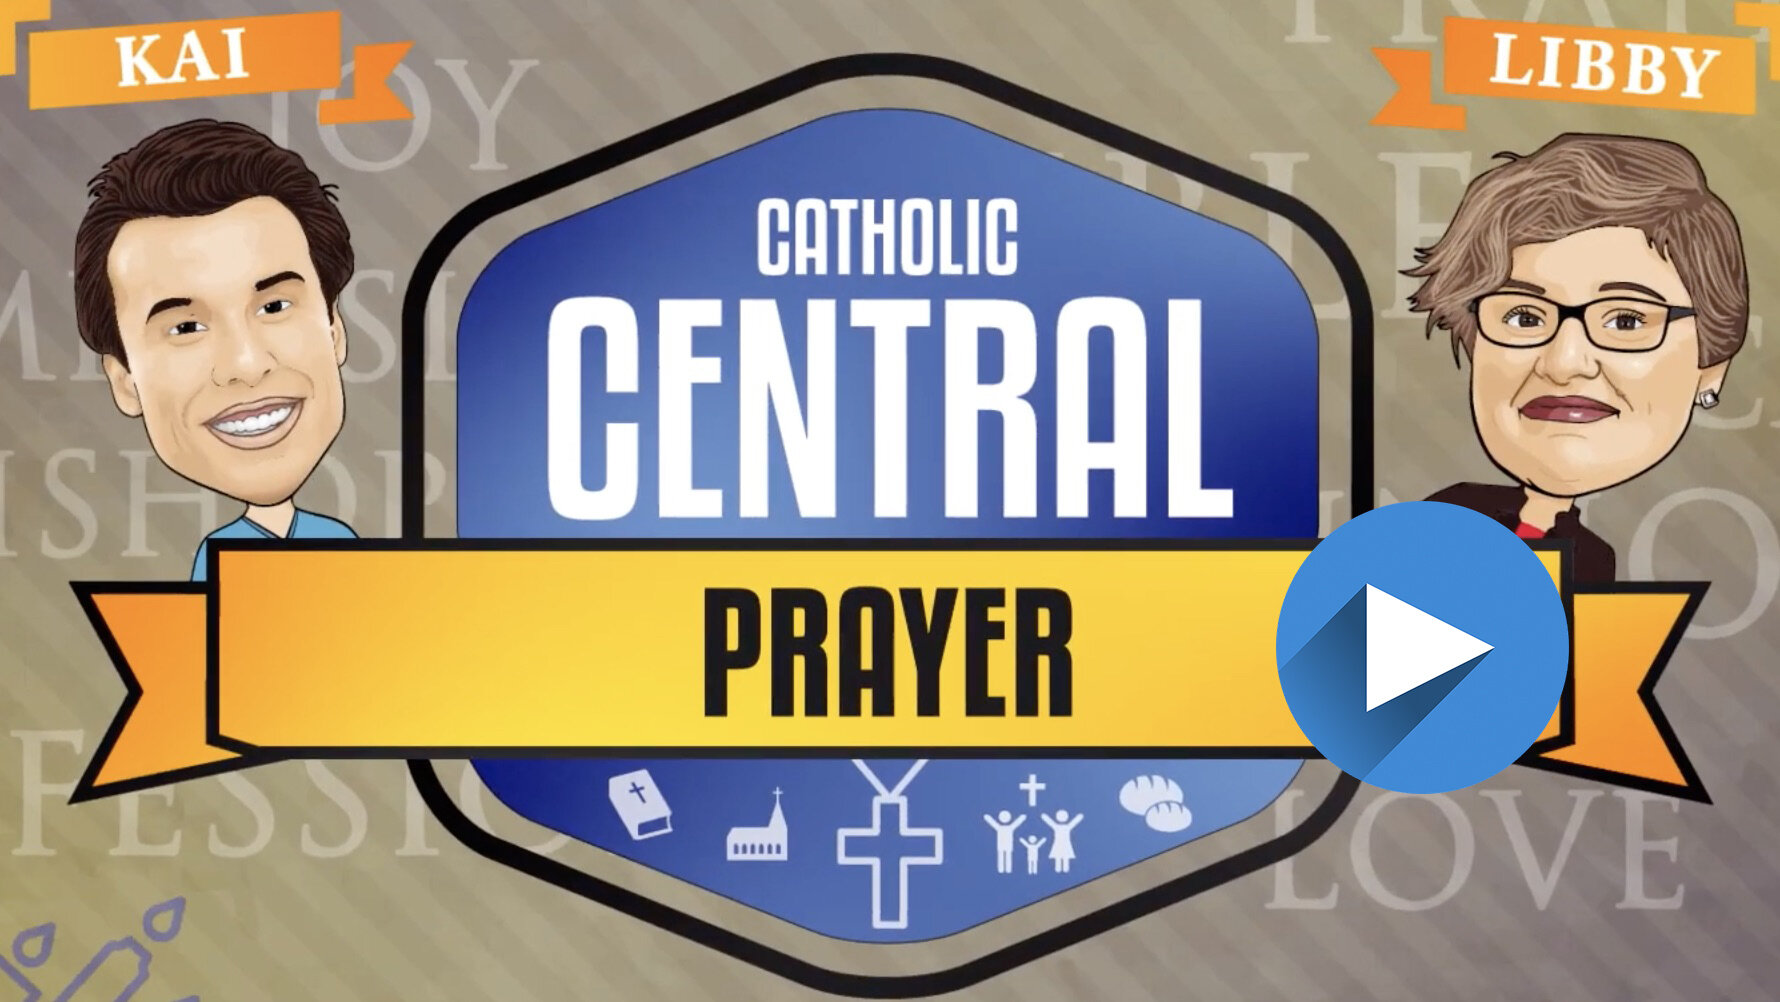 PRAYER VIDEO 1 COVER with arrow.jpg